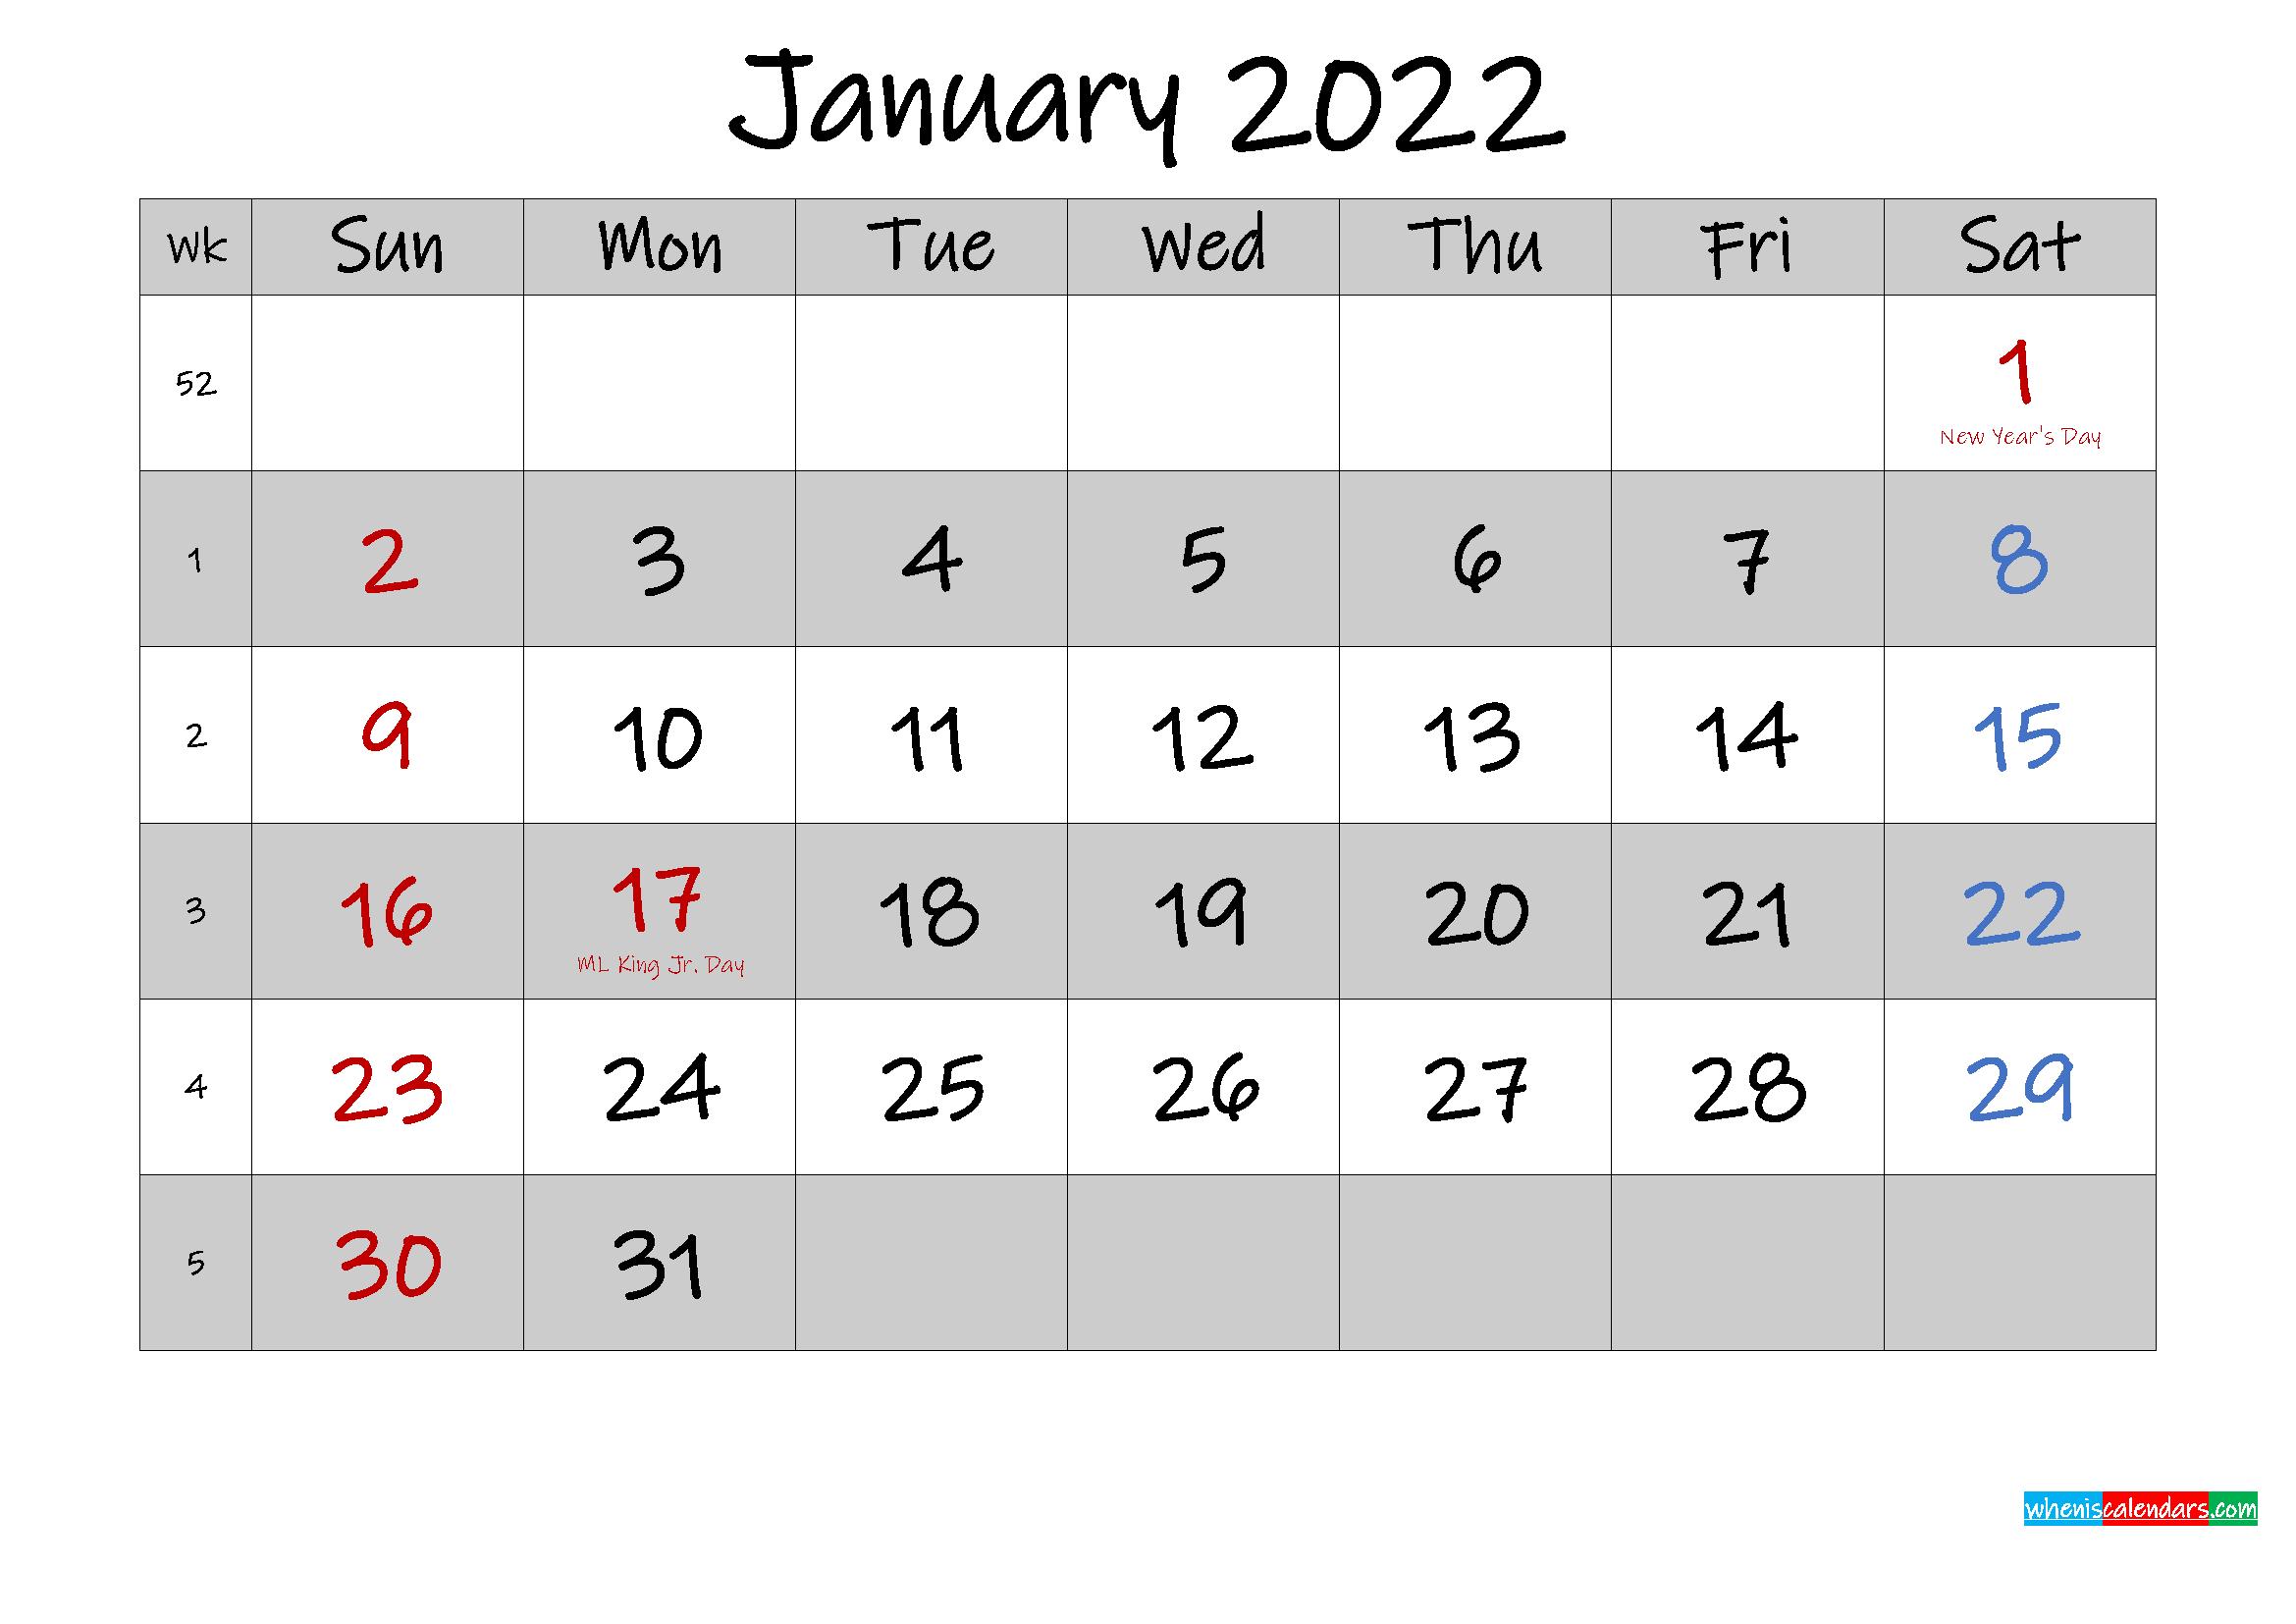 Free Printable January 2022 Calendar With Holidays Regarding Images Of January 2022 Calendar